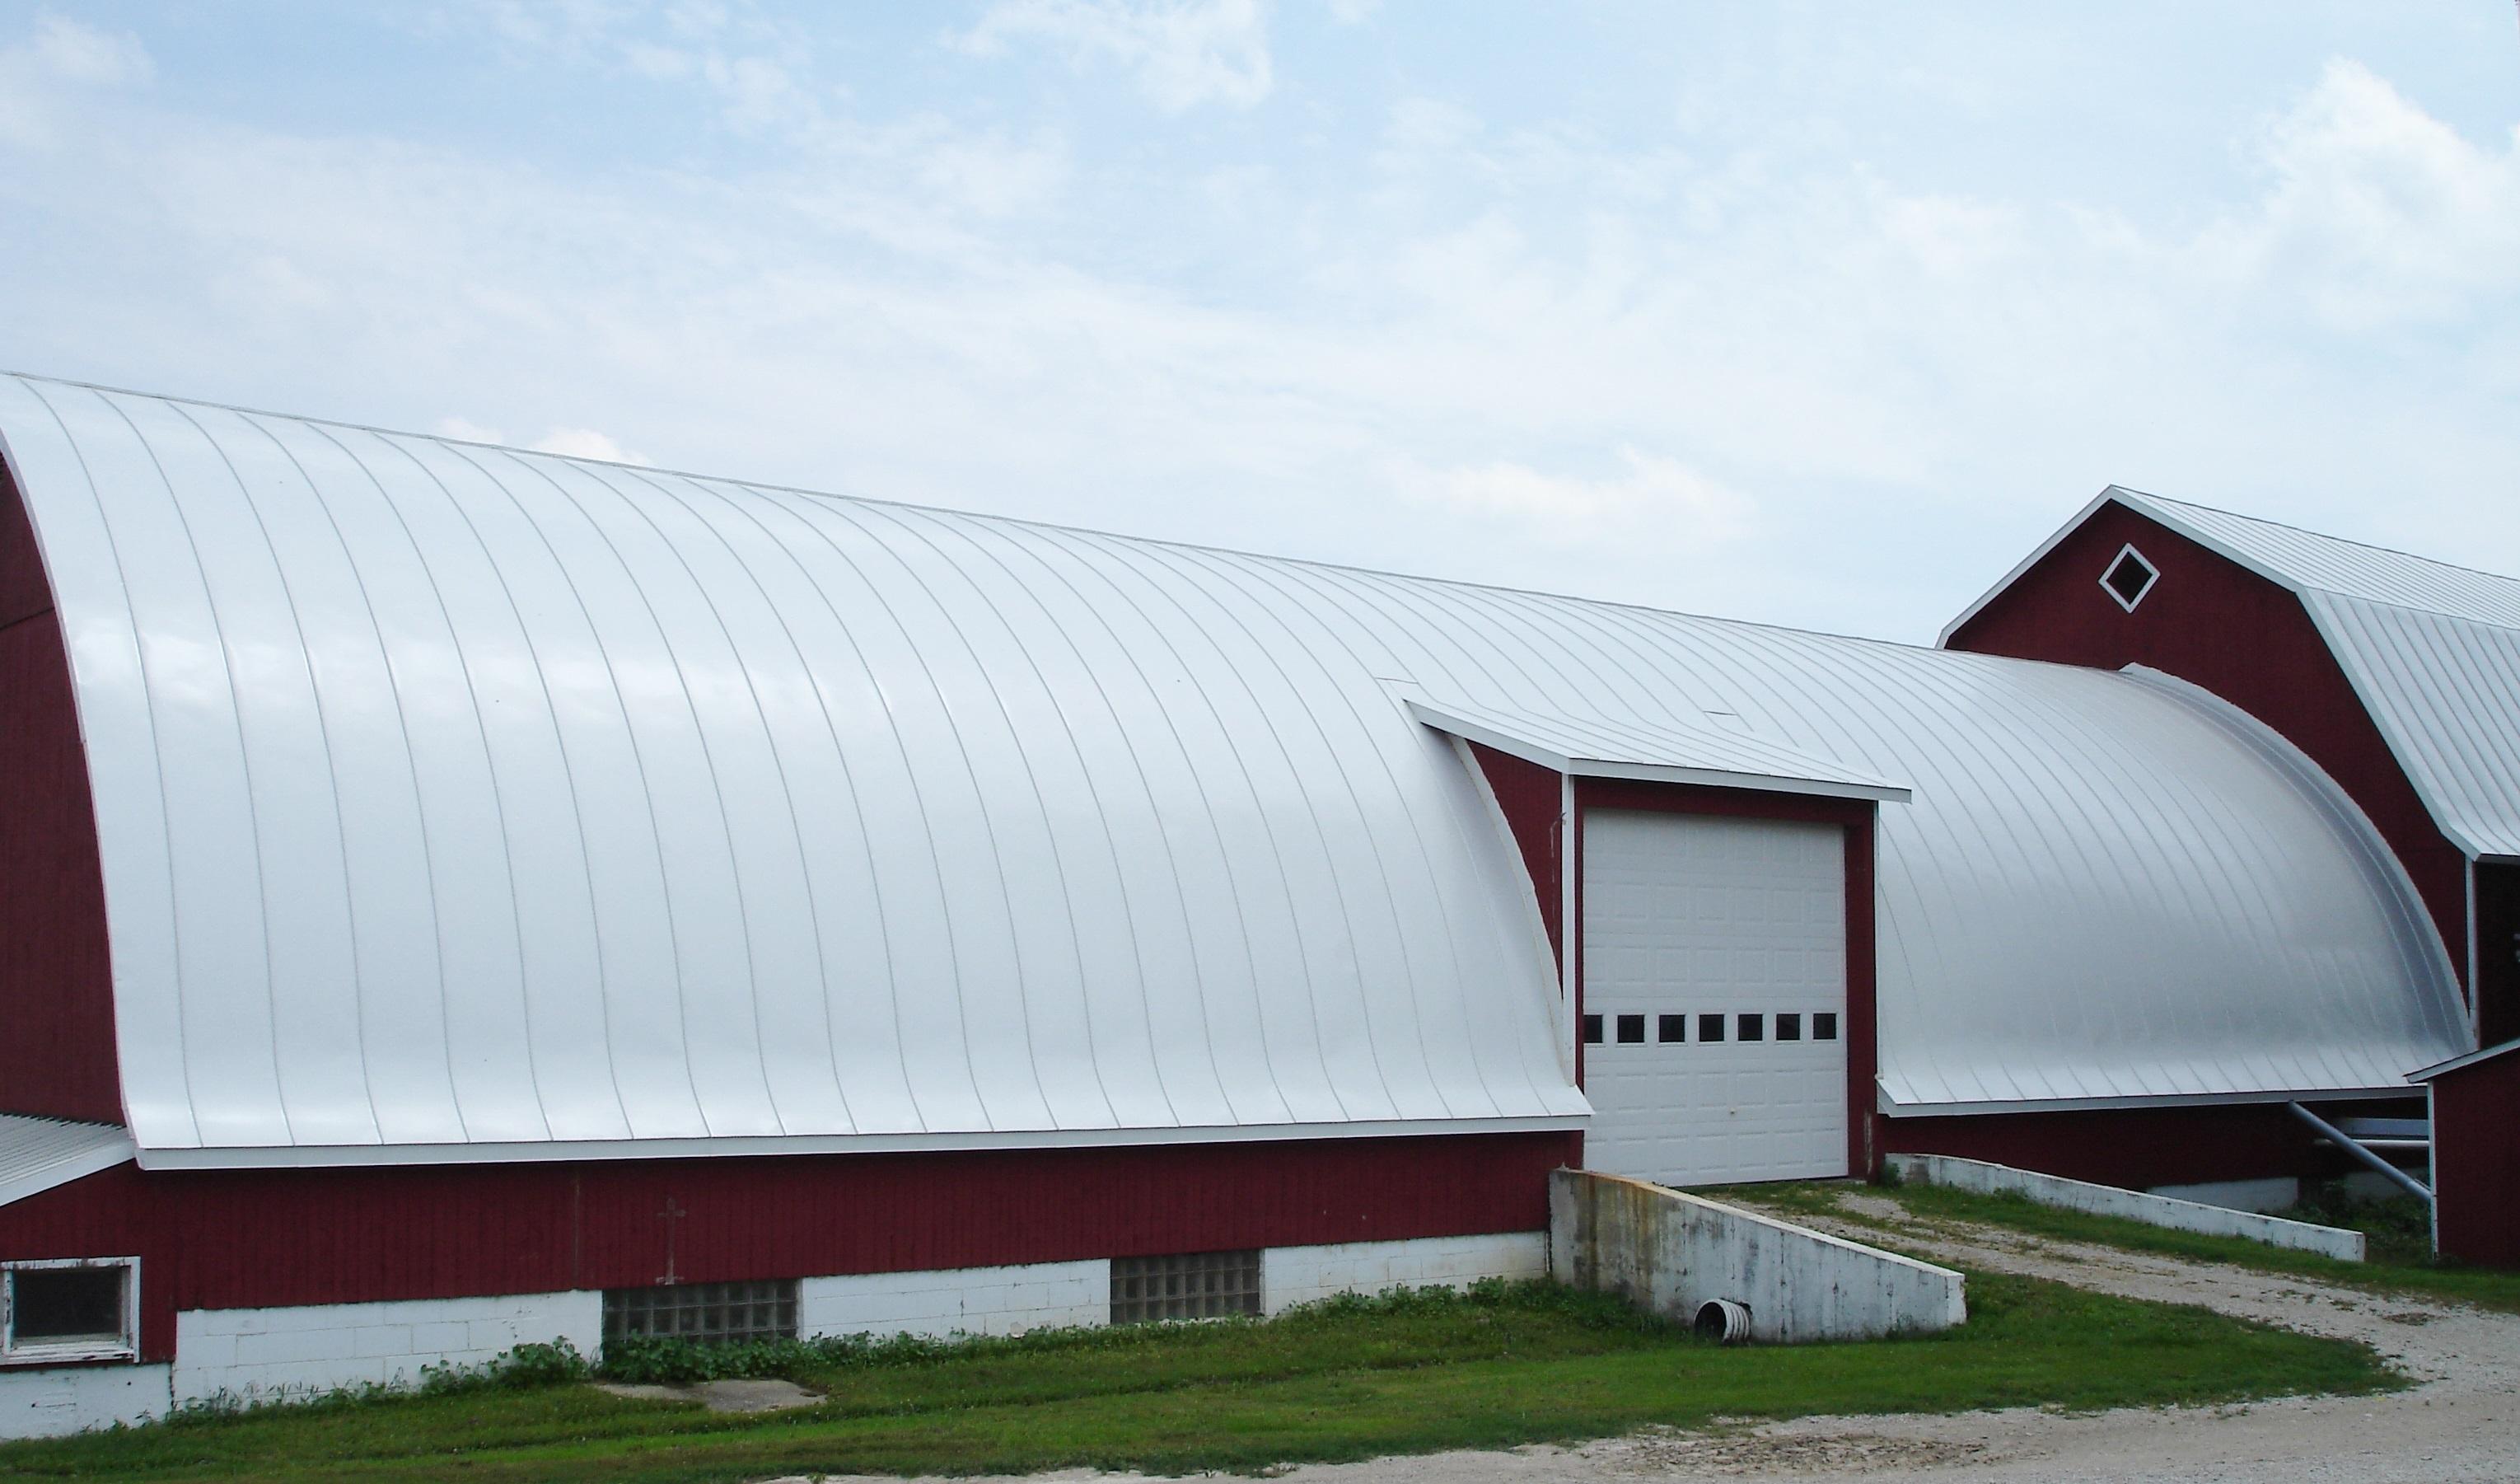 barn gothic hip bright white silver galvanized standing seam sheet metal roofing agricultural culpitt wisconsin illinois minnesota iowa north dakota